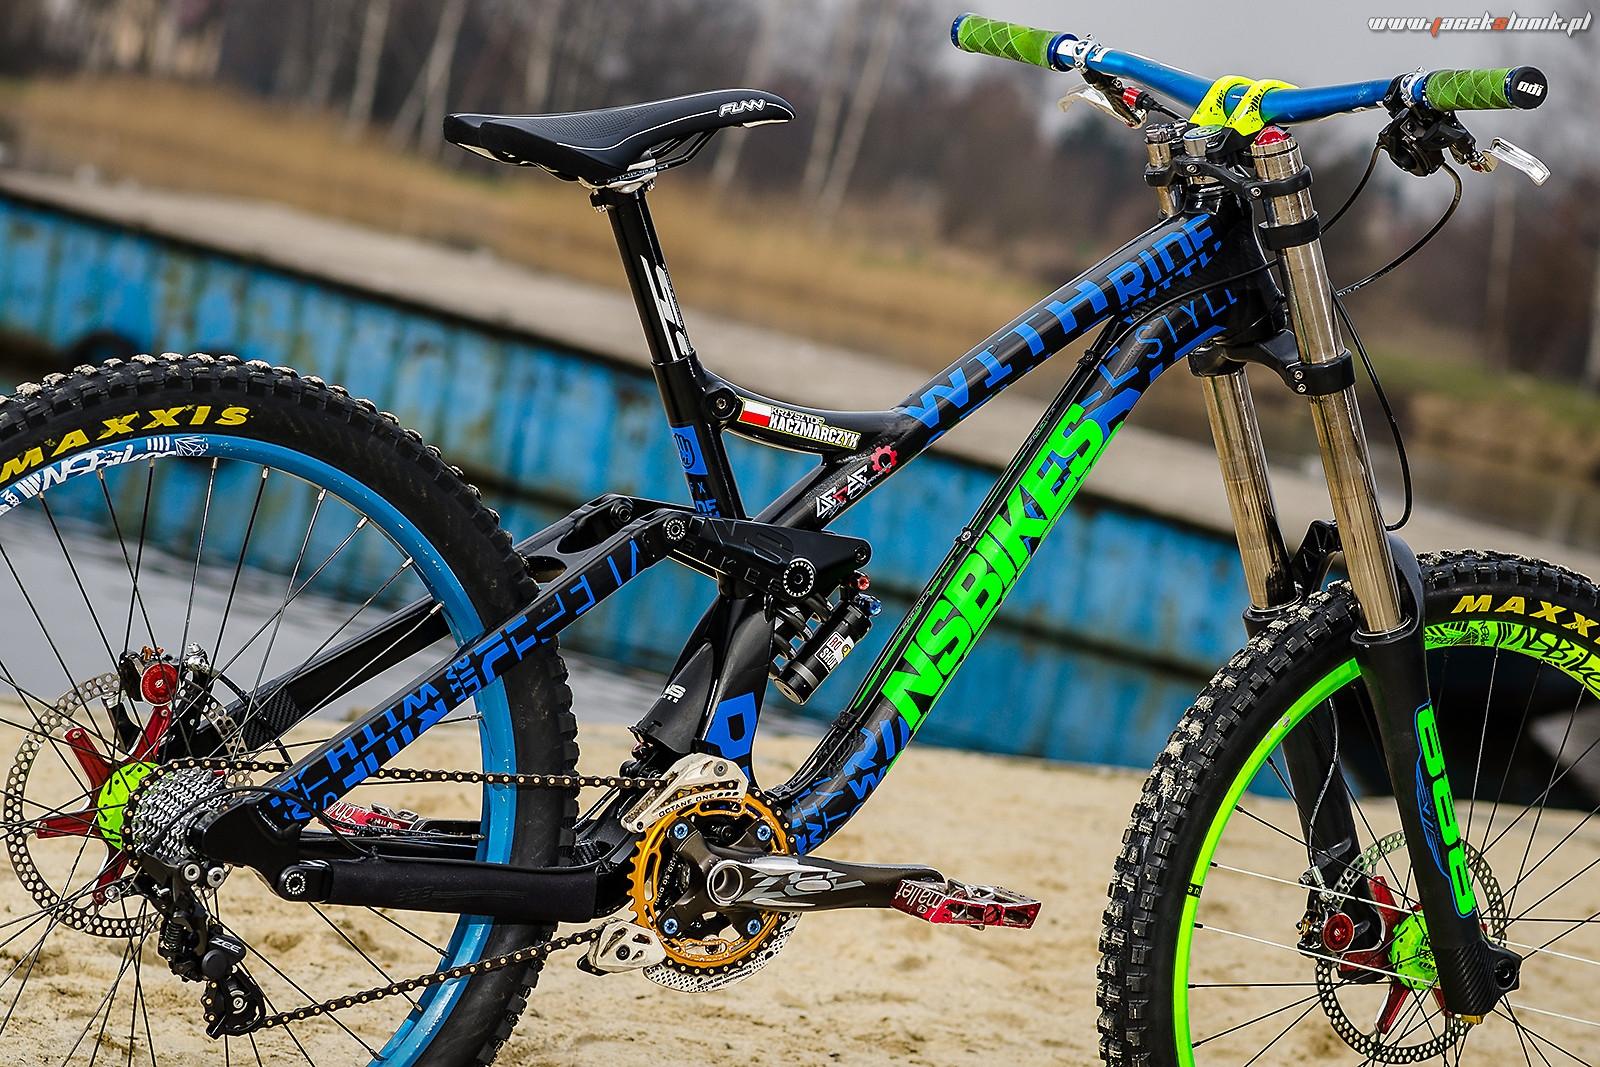 c03ab7a0110 NS Bikes 2015 - Stay True!